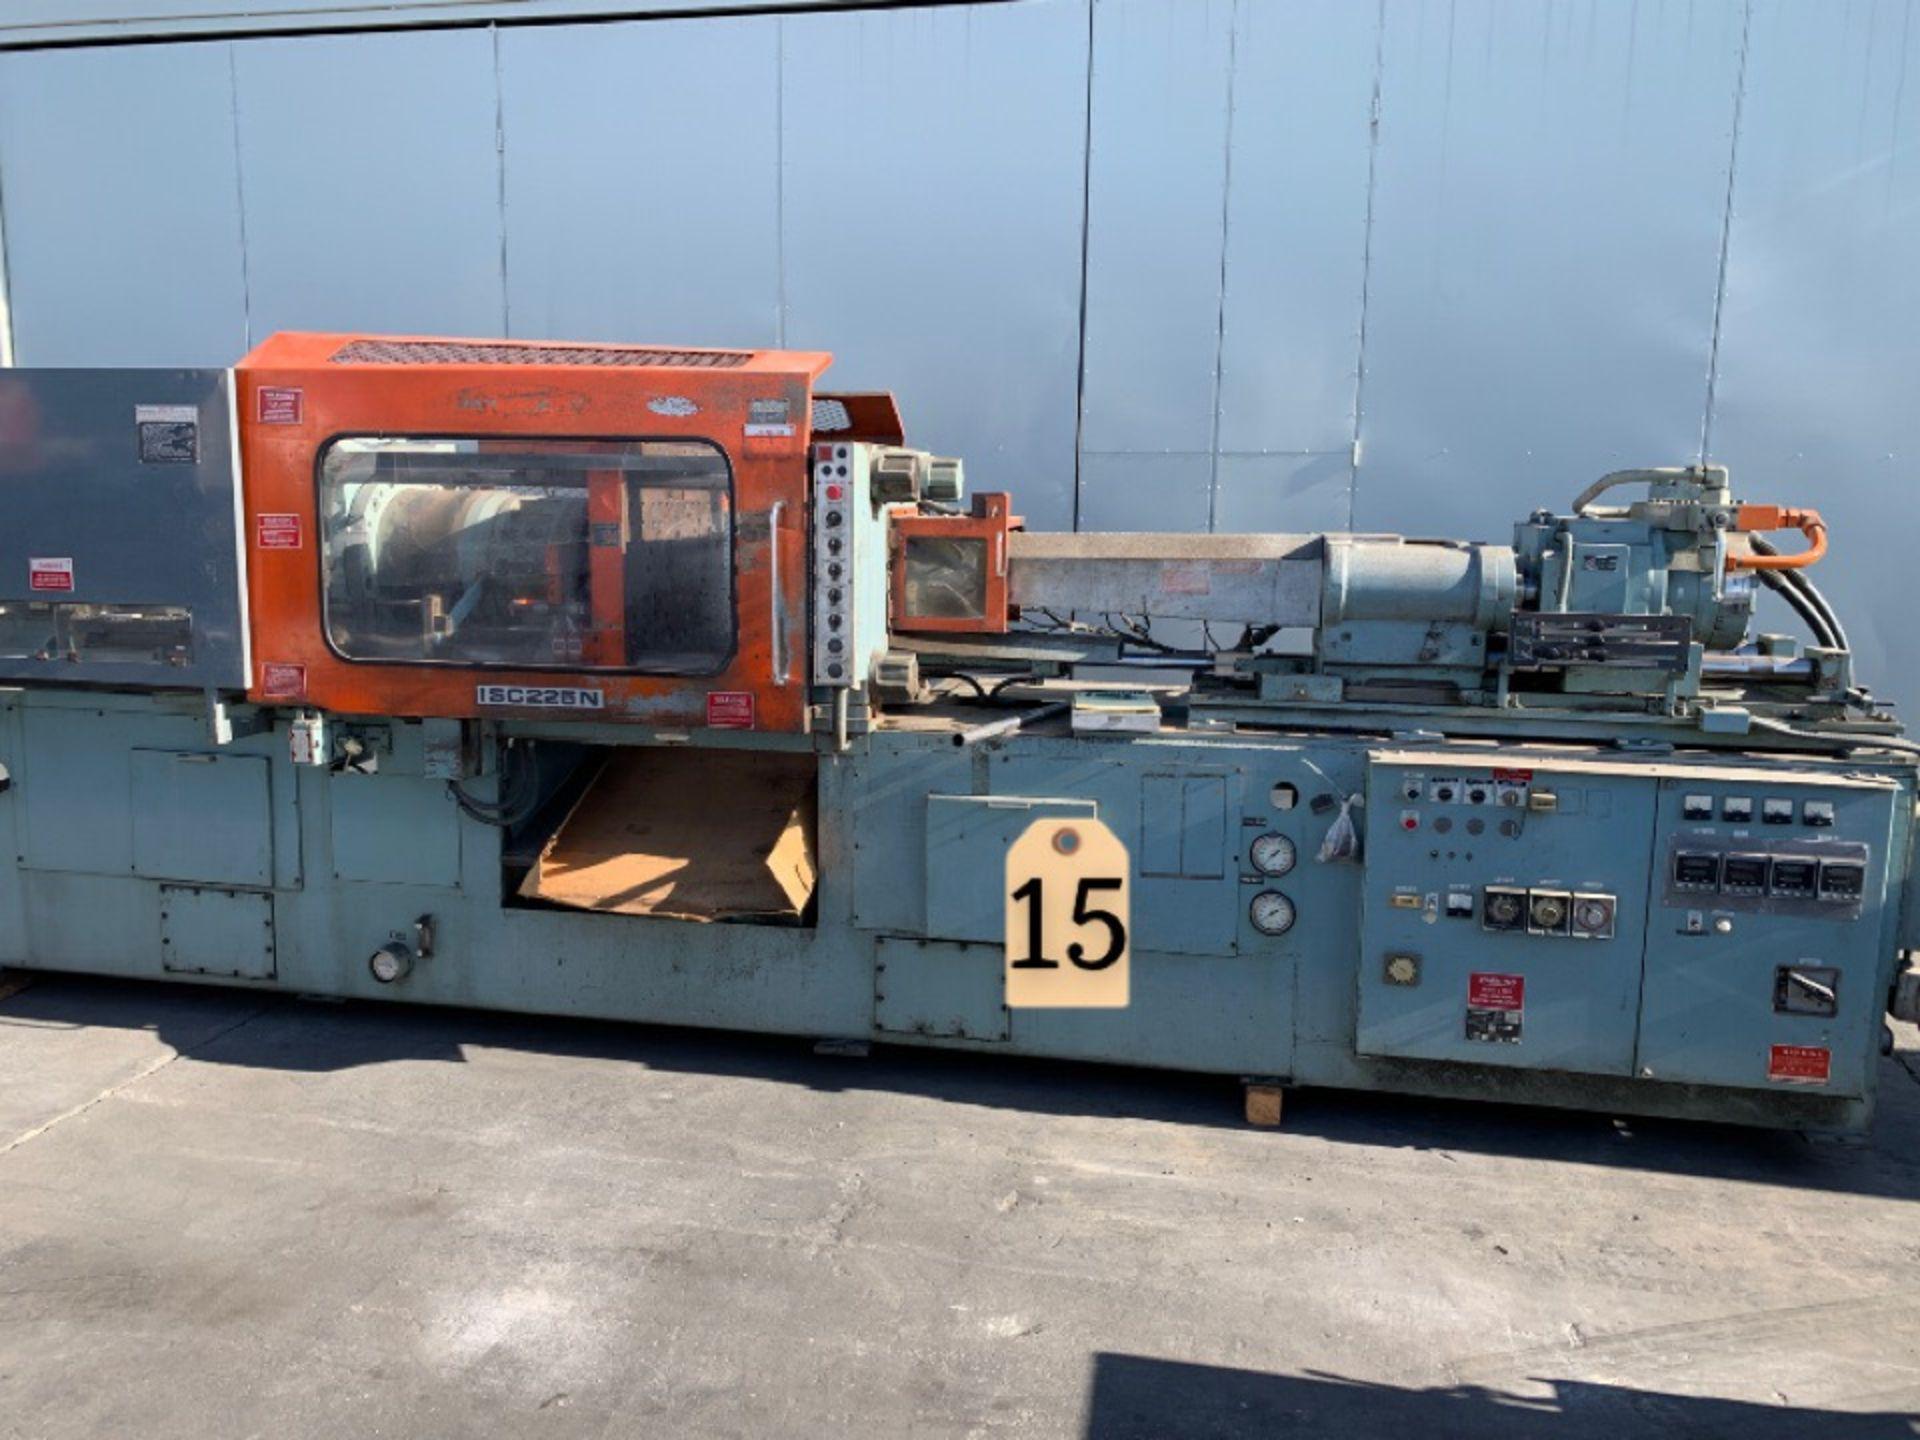 225 TON TOSHIBA ISC225N INJECTION MOLDING MACHINE